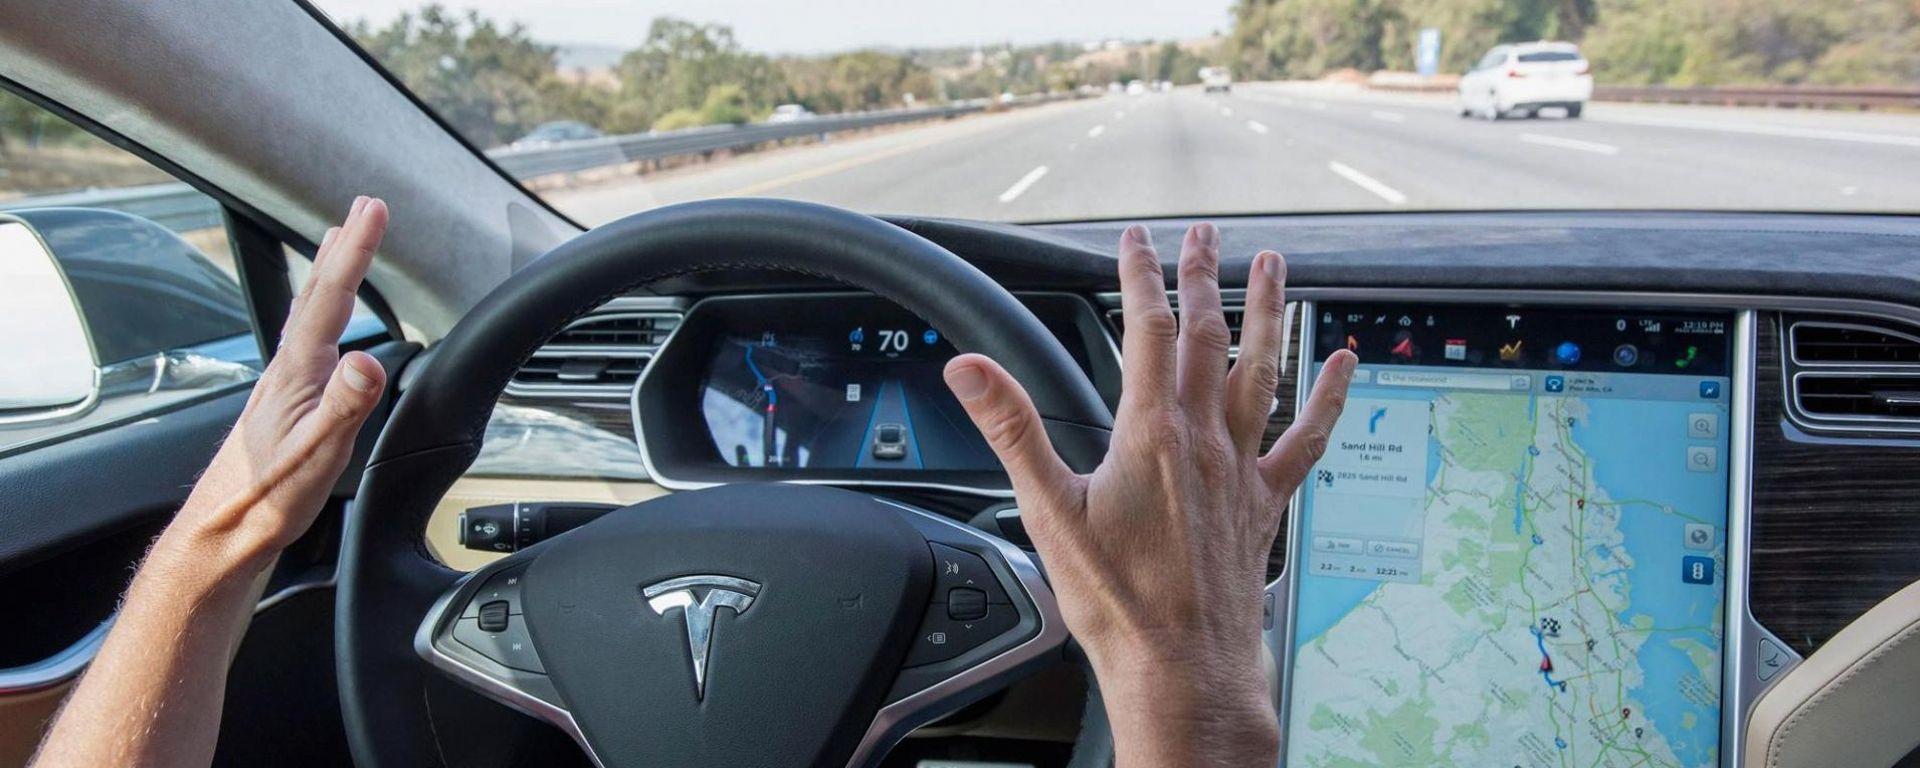 Tesla, un'assicurazione americana offre sconti grazie all'autopilot